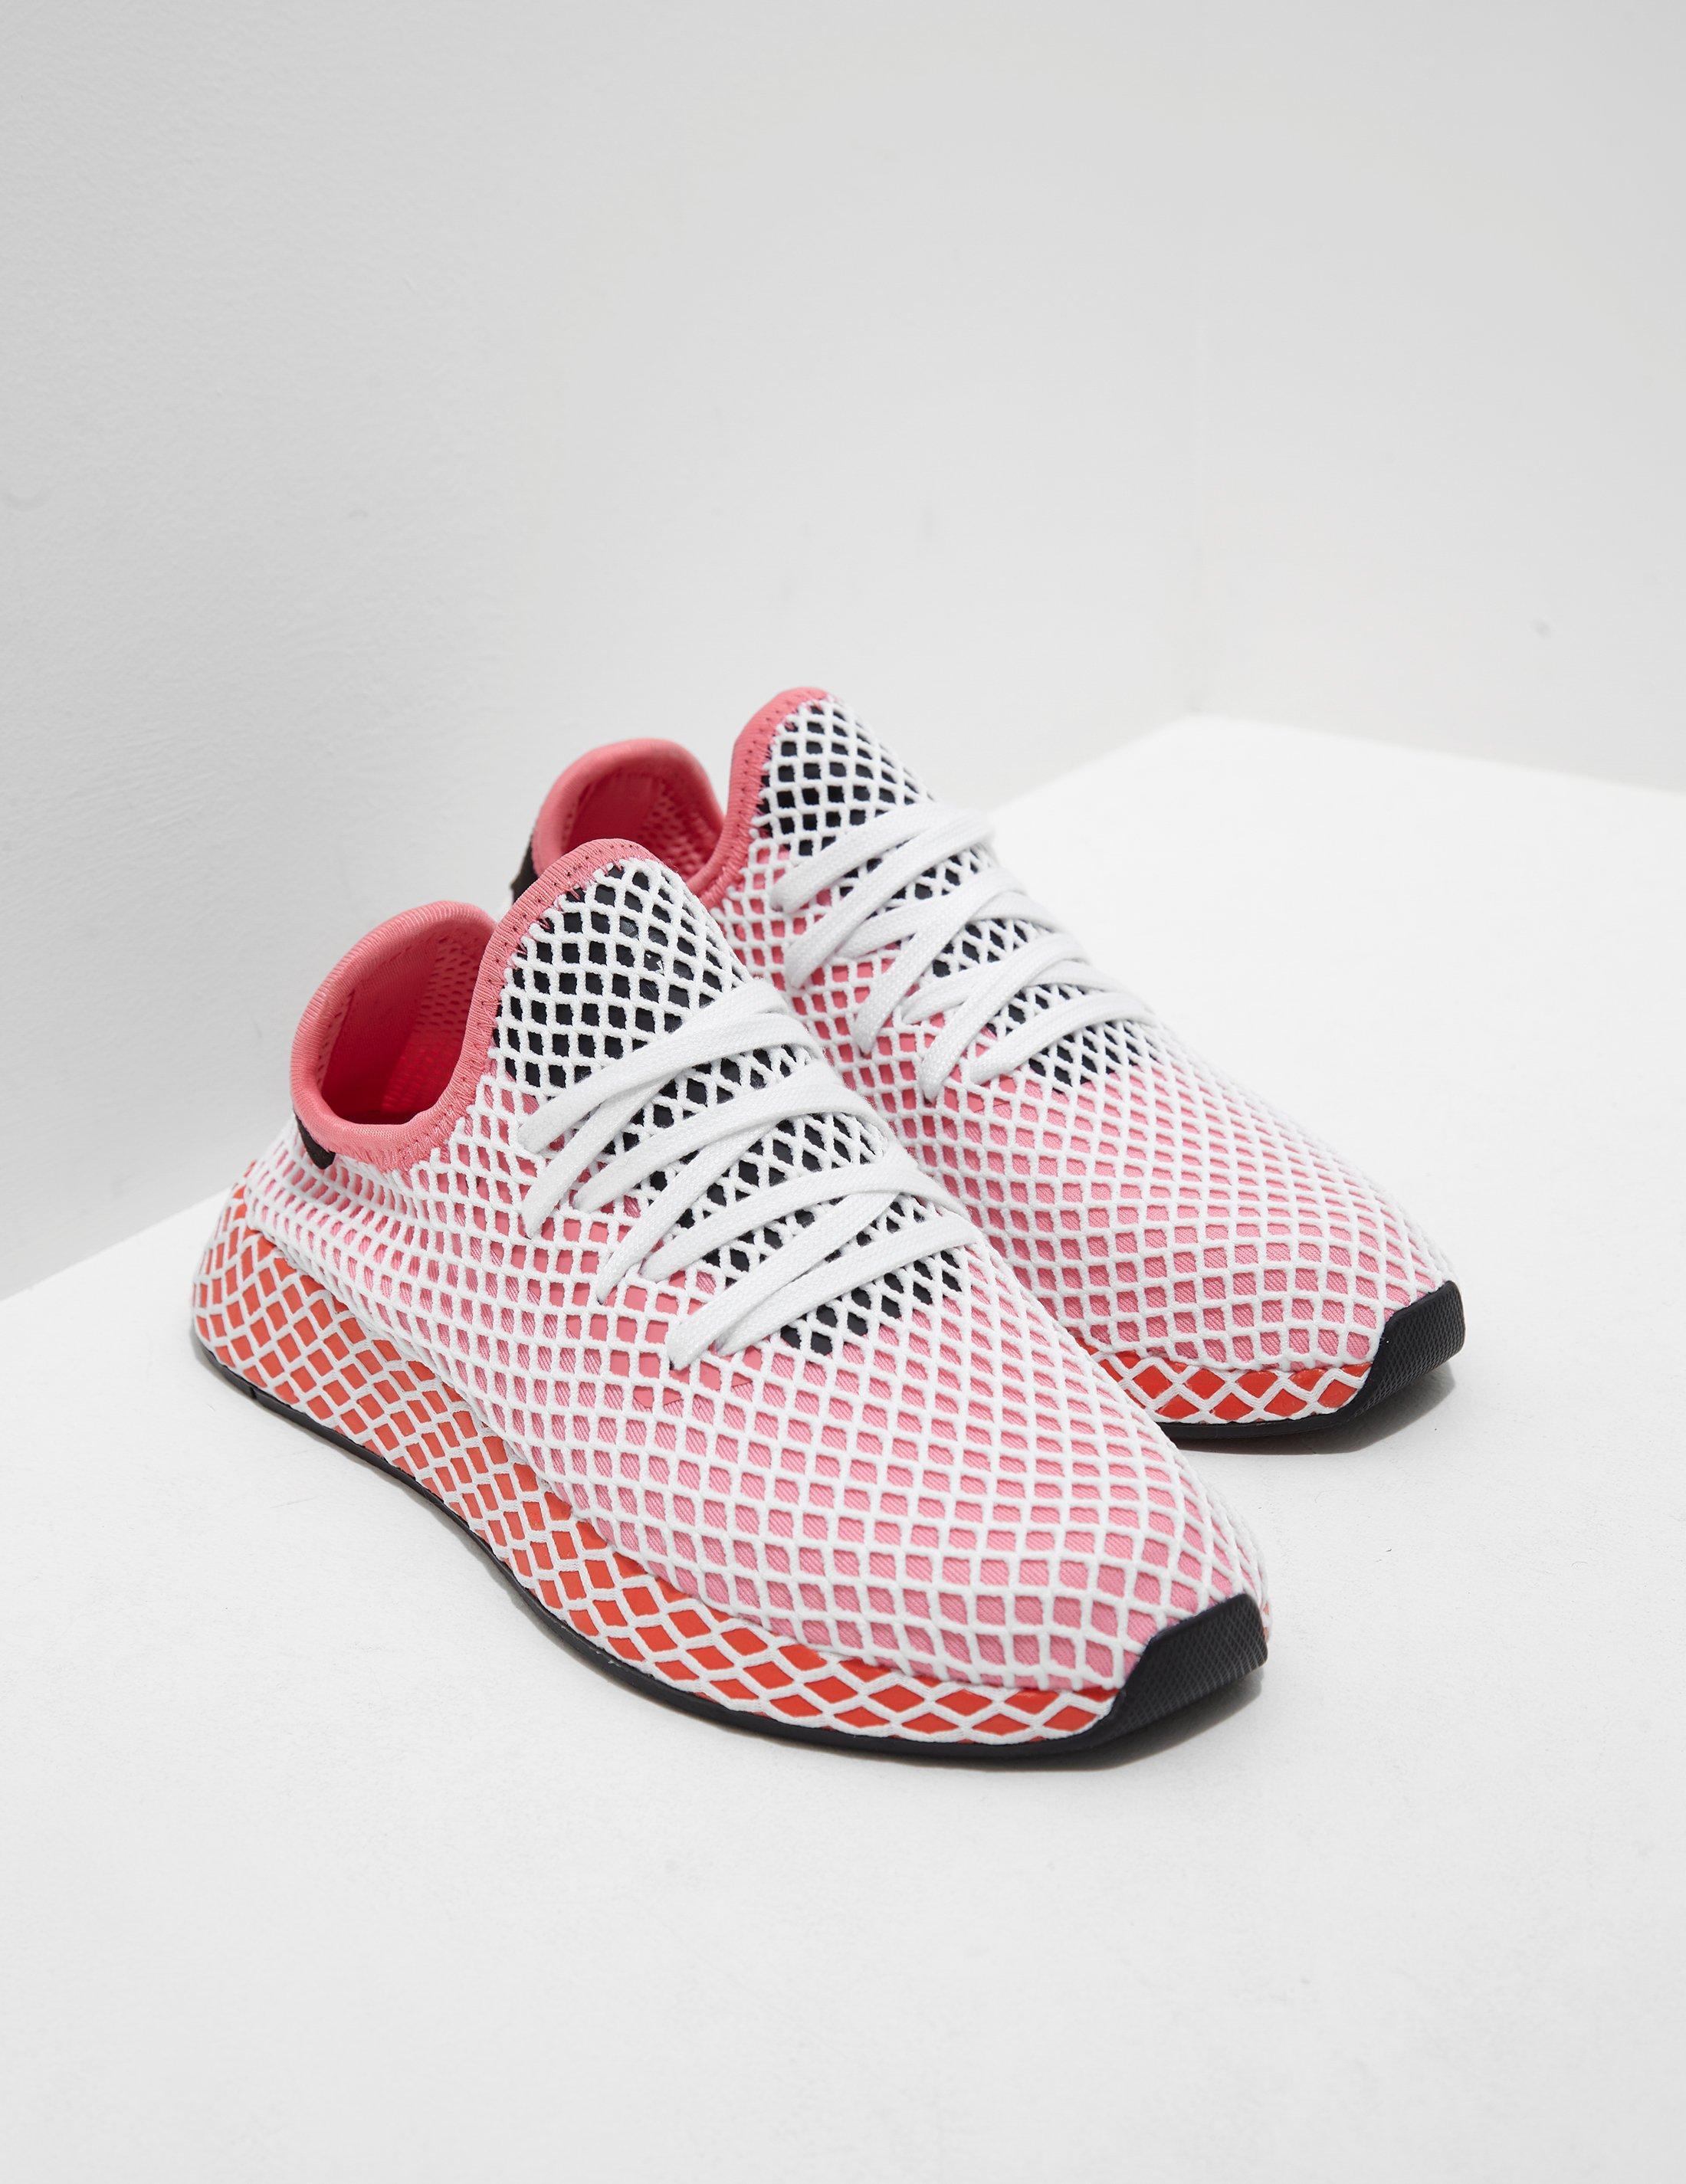 lyst adidas originali di donne deerupt donna rosa in rosa